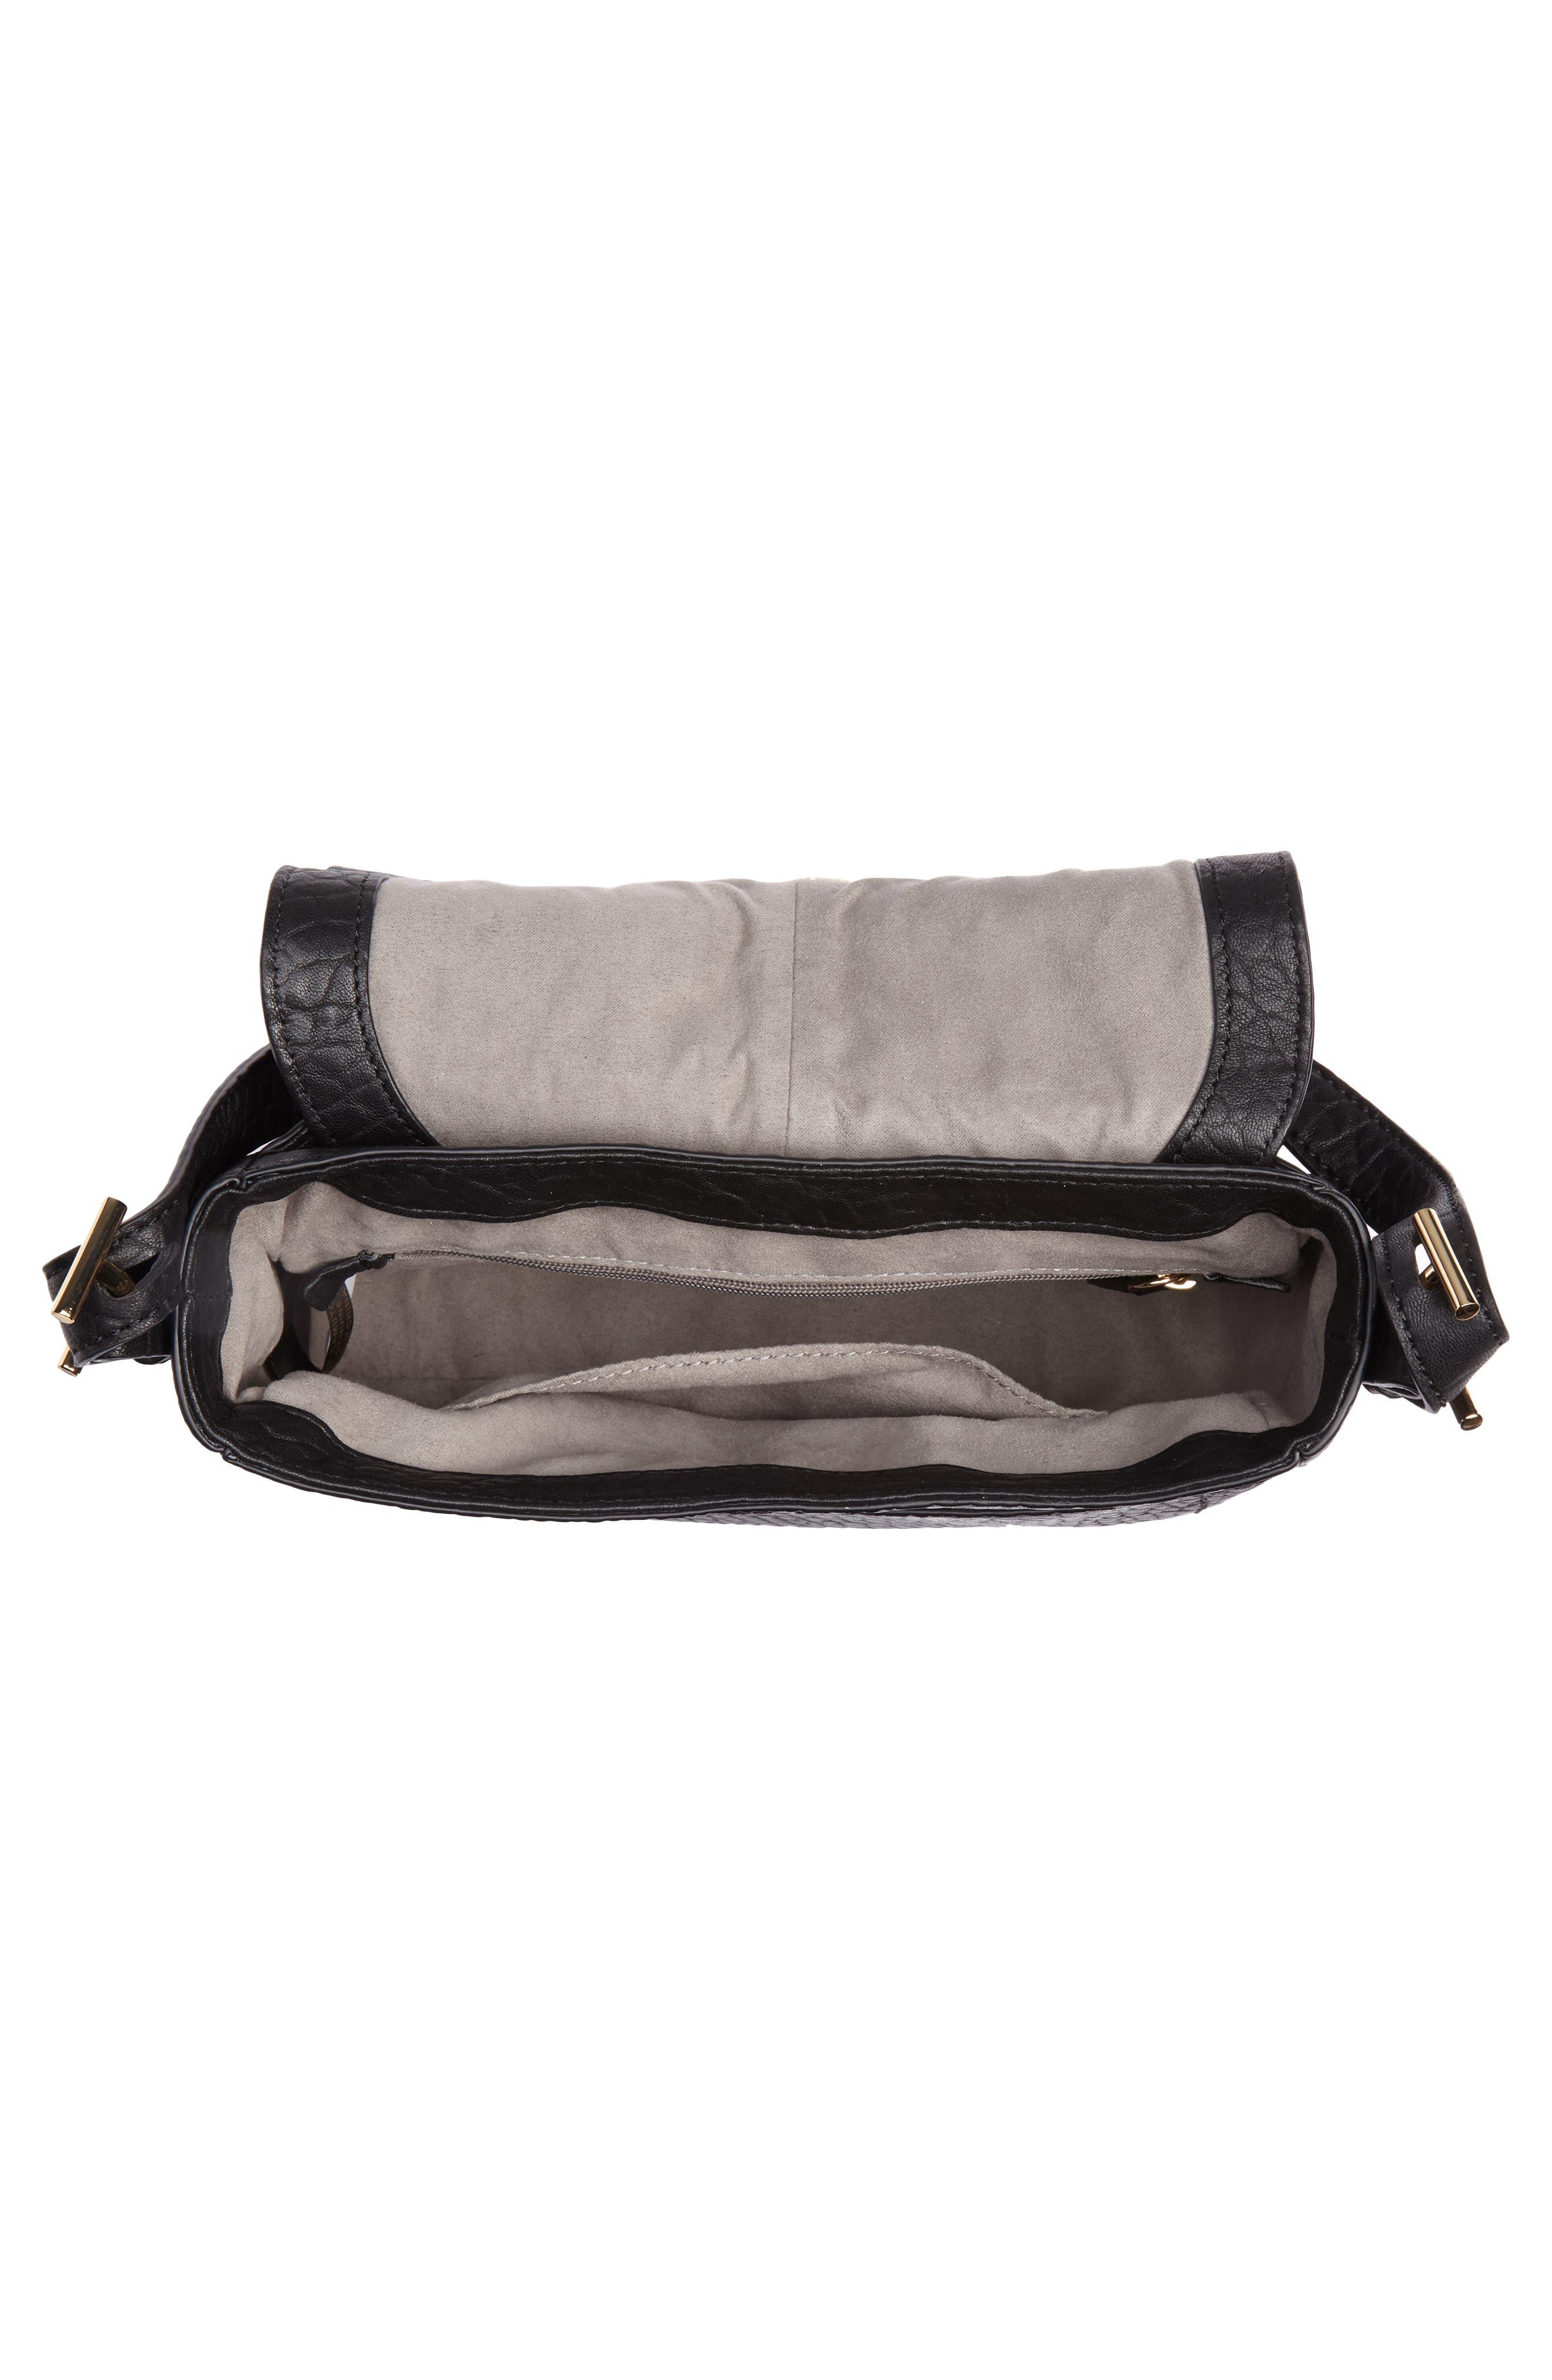 Fava Leather Crossbody Bag,                             Alternate thumbnail 4, color,                             001